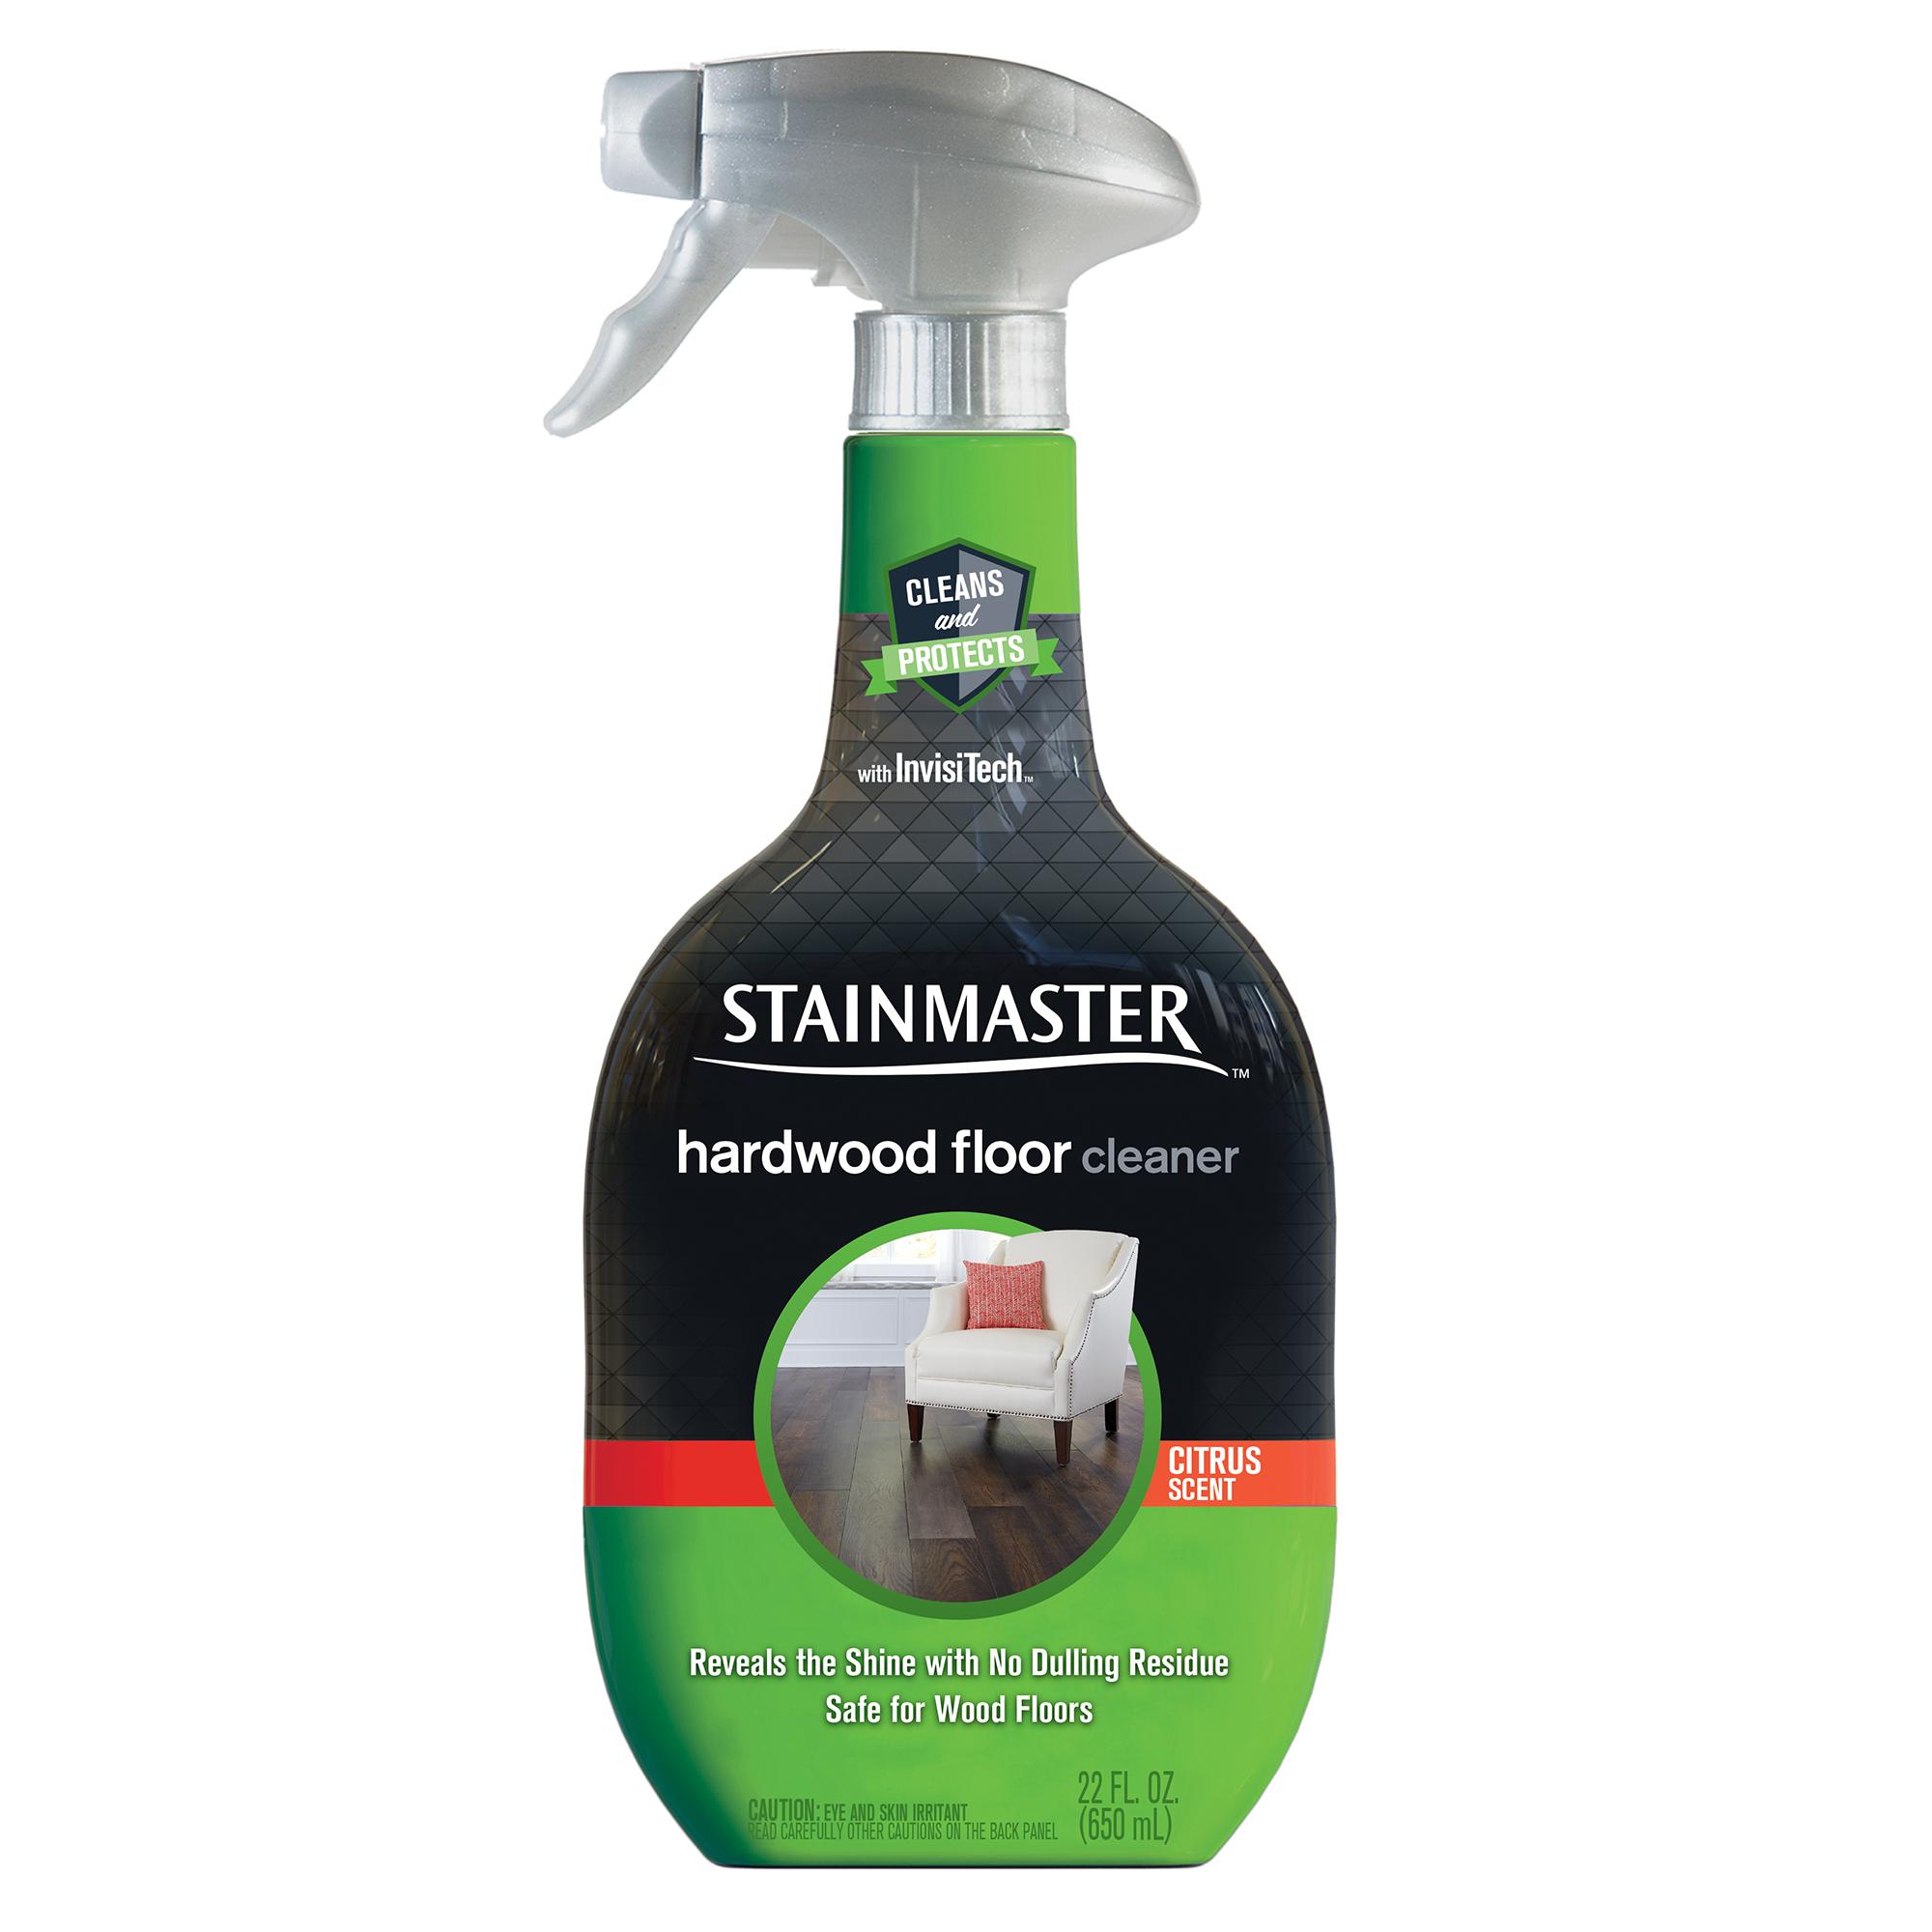 STAINMASTER Hardwood Floor Cleaner Spray, 22oz